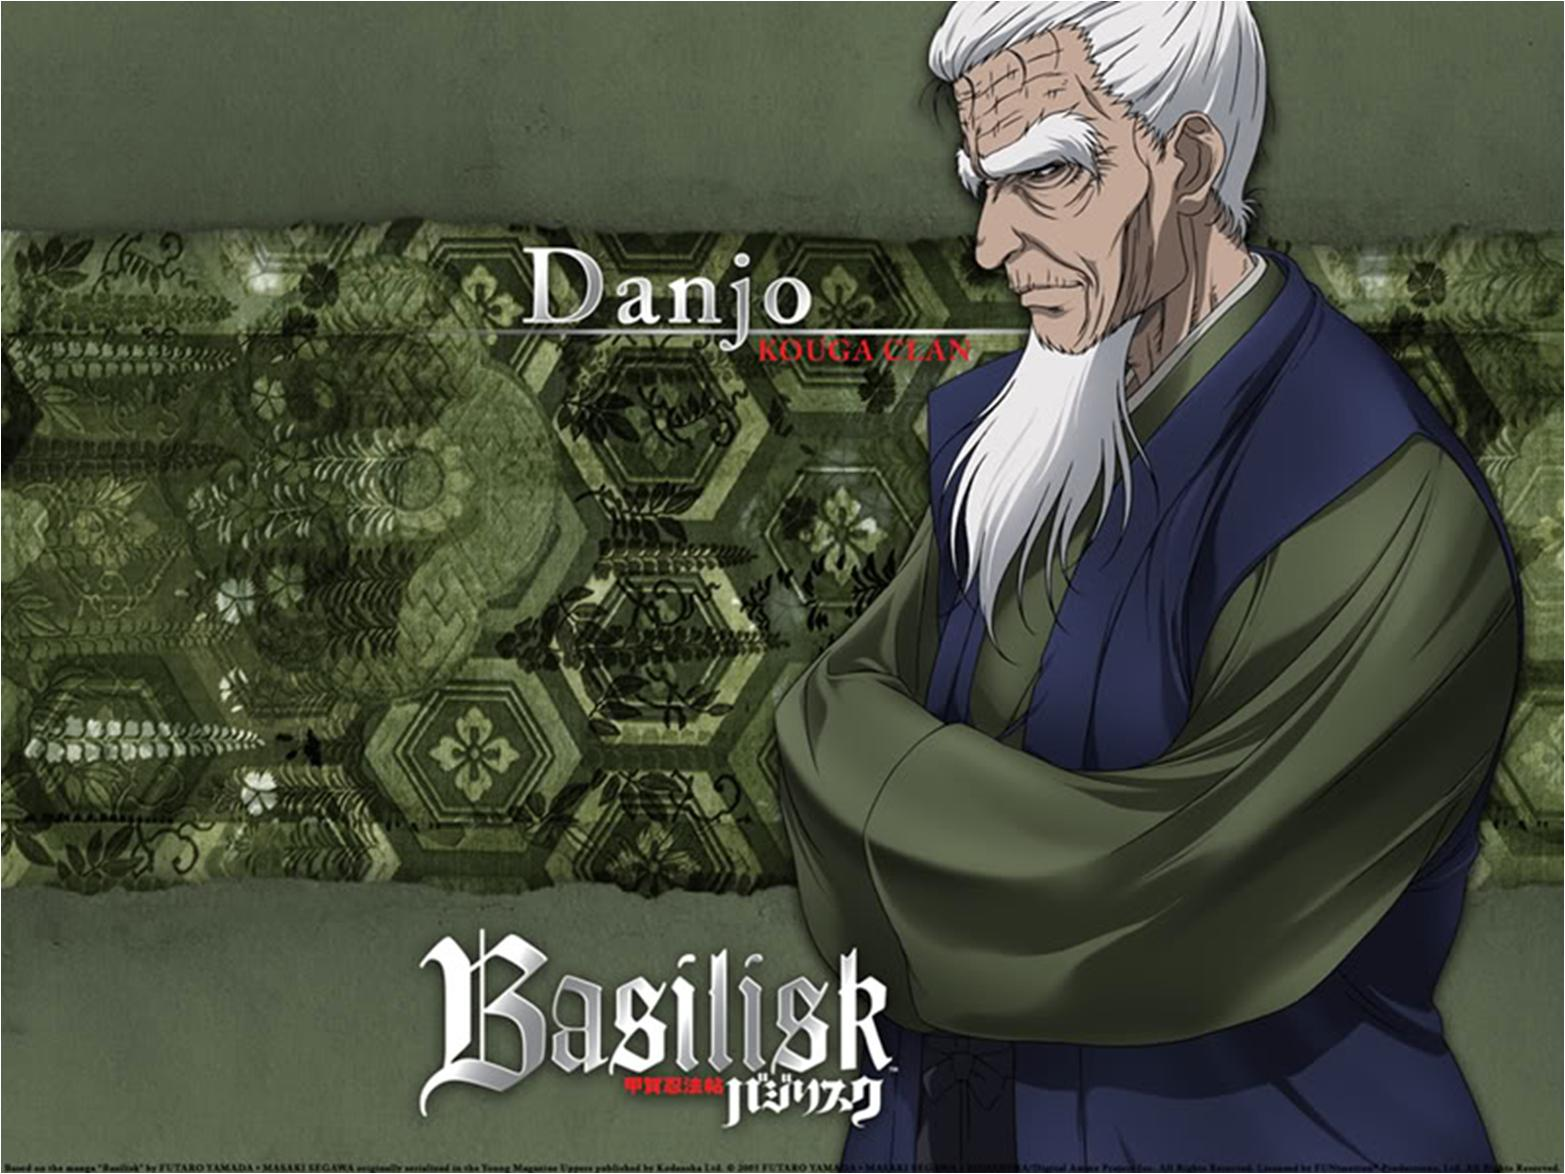 Basilisk - Danjou Kouga